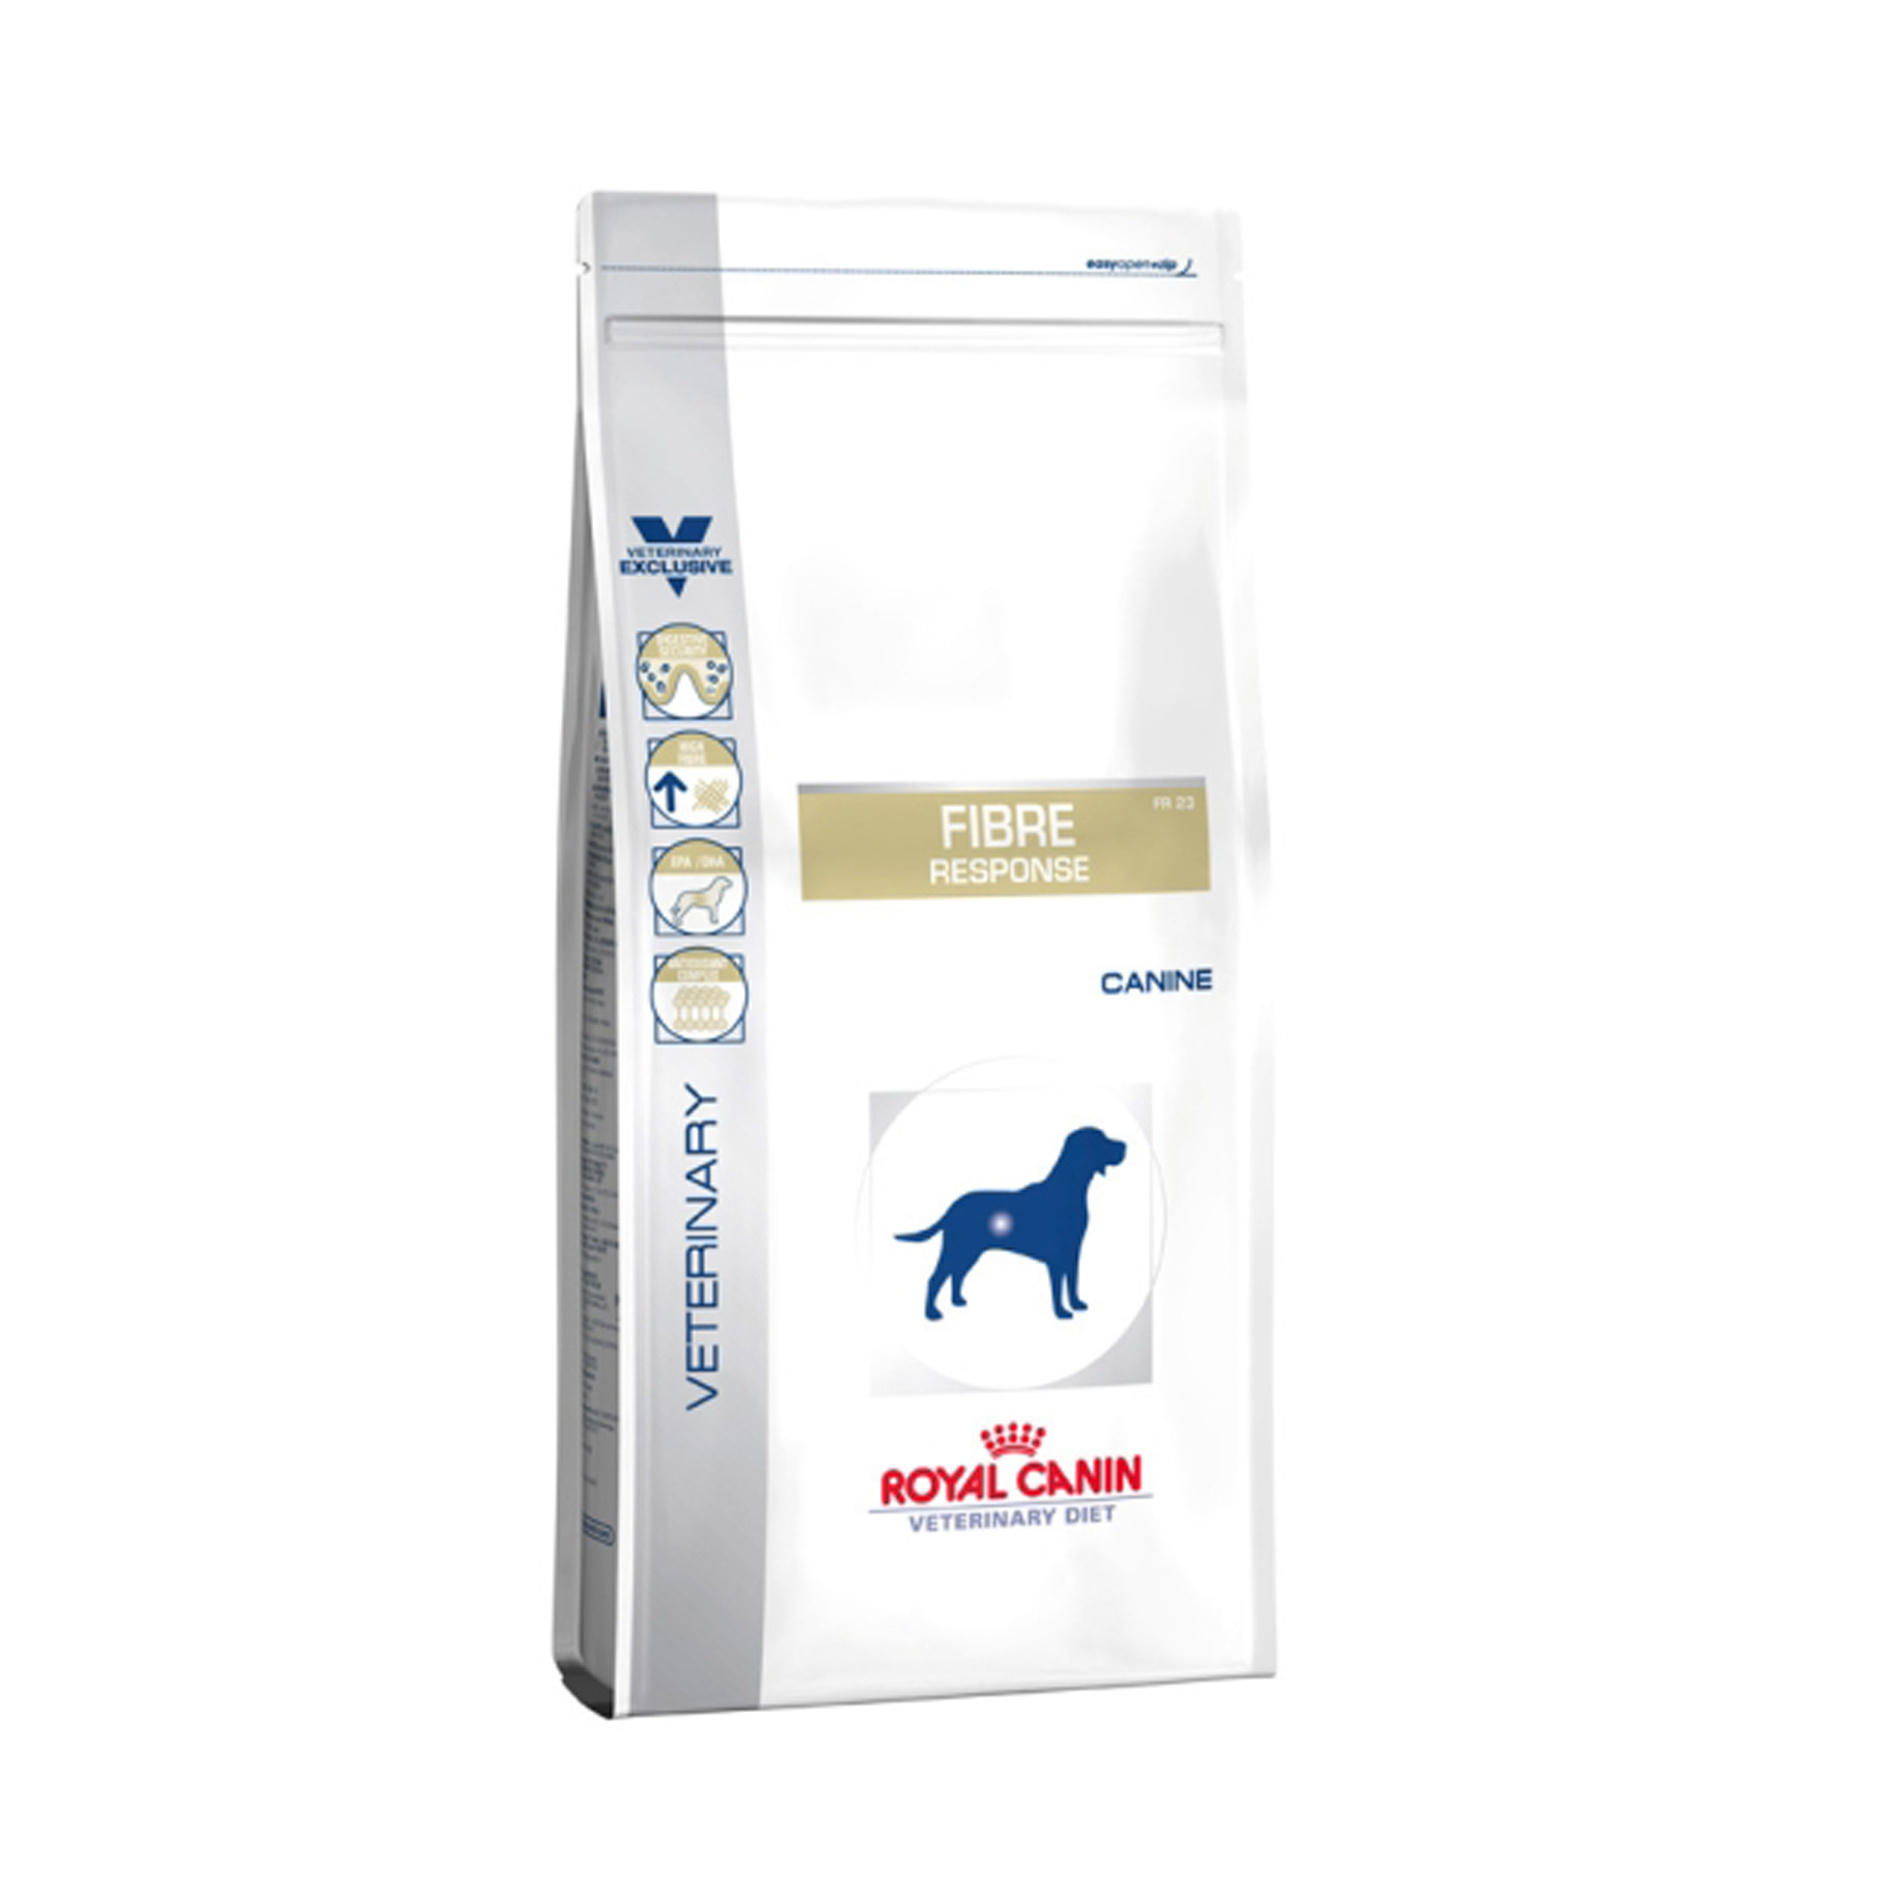 Royal Canin Canine Veterinary Diet Fibre Response